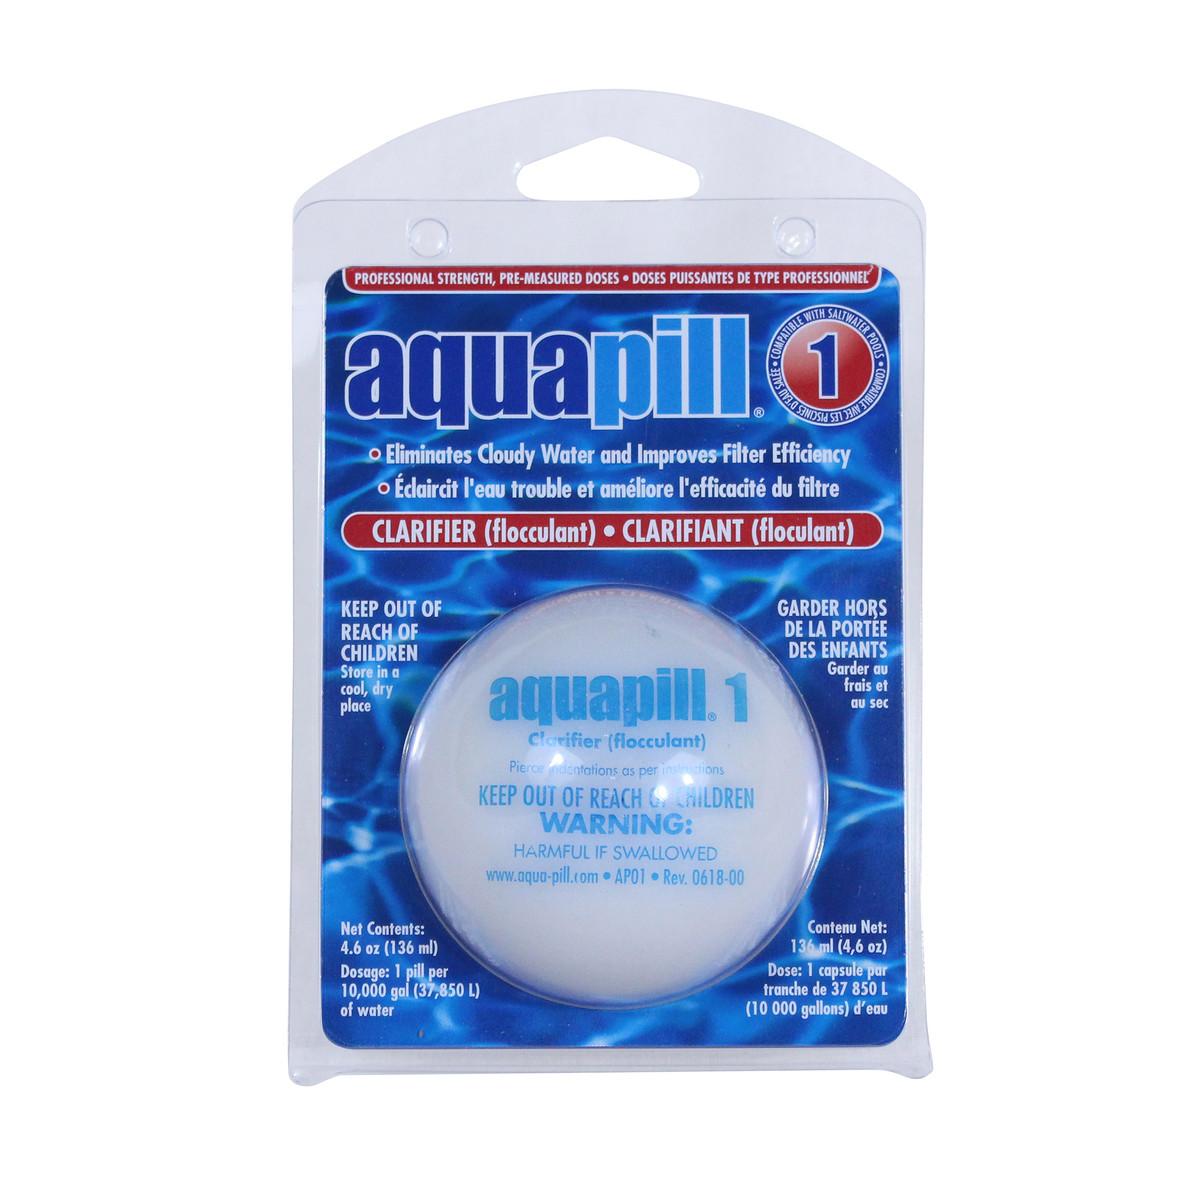 Aqua Pill 1 Water Clarifier Flocculant Pool Clarifiers Flocculants Splash Super Center